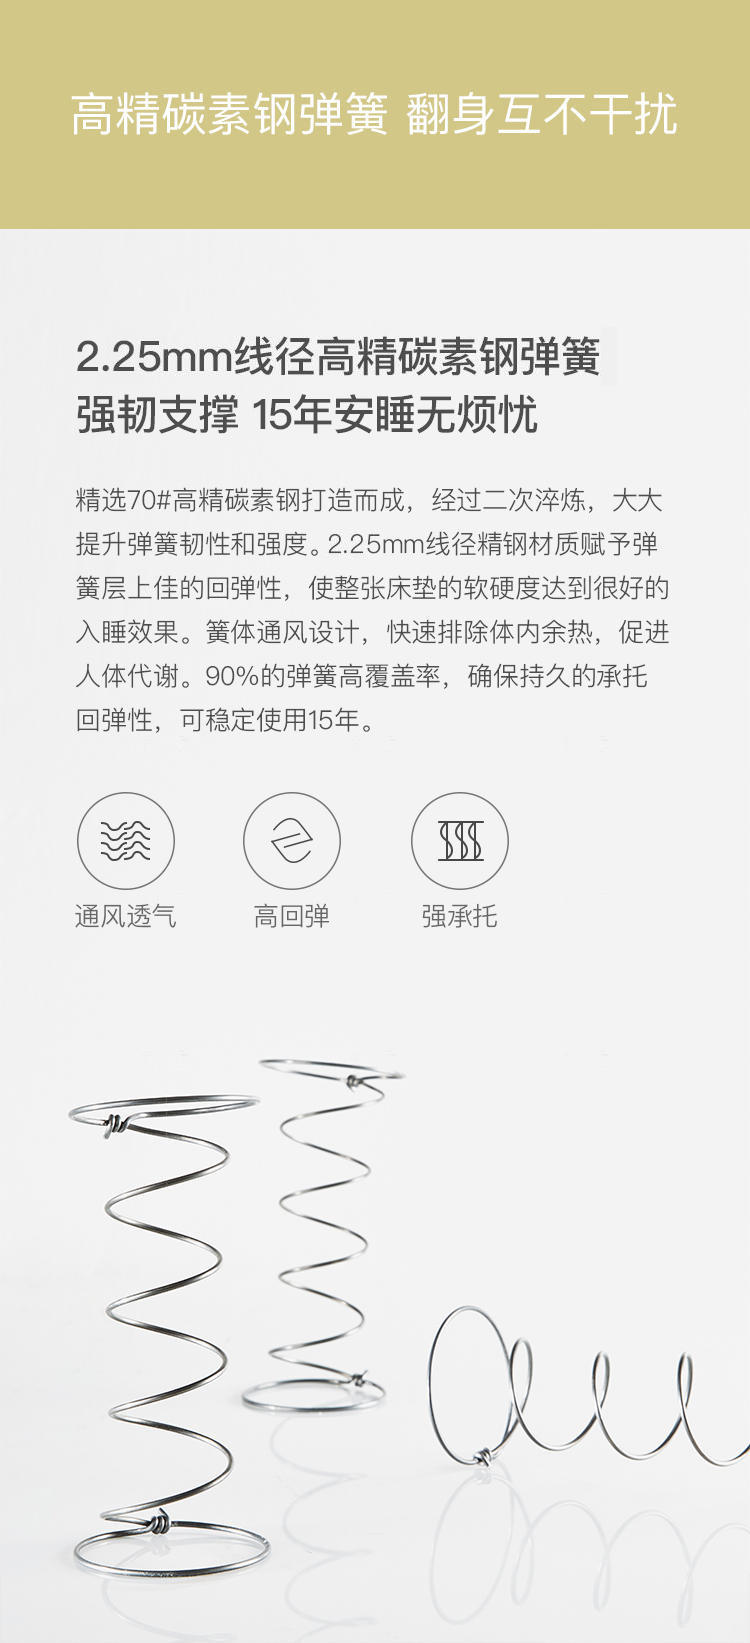 HKF系列DL02双面温感床垫的详细介绍